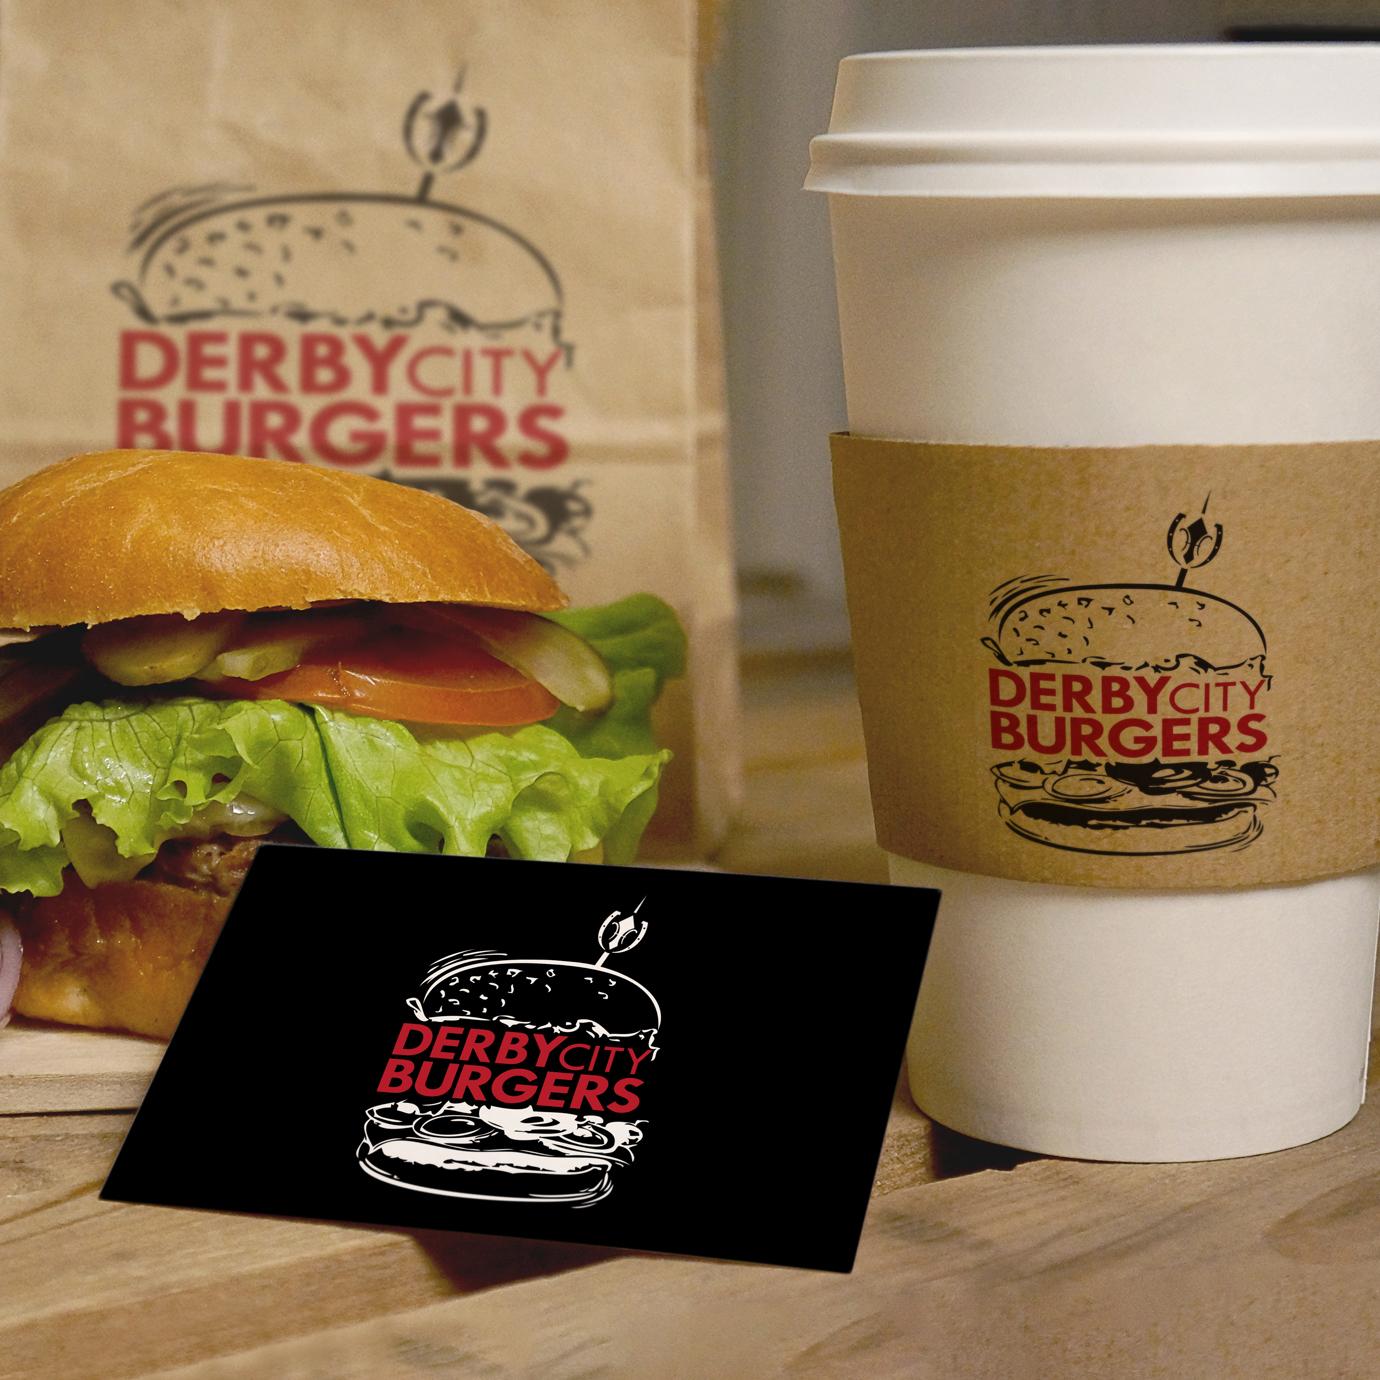 derby-city-burgers-logo-design.jpg